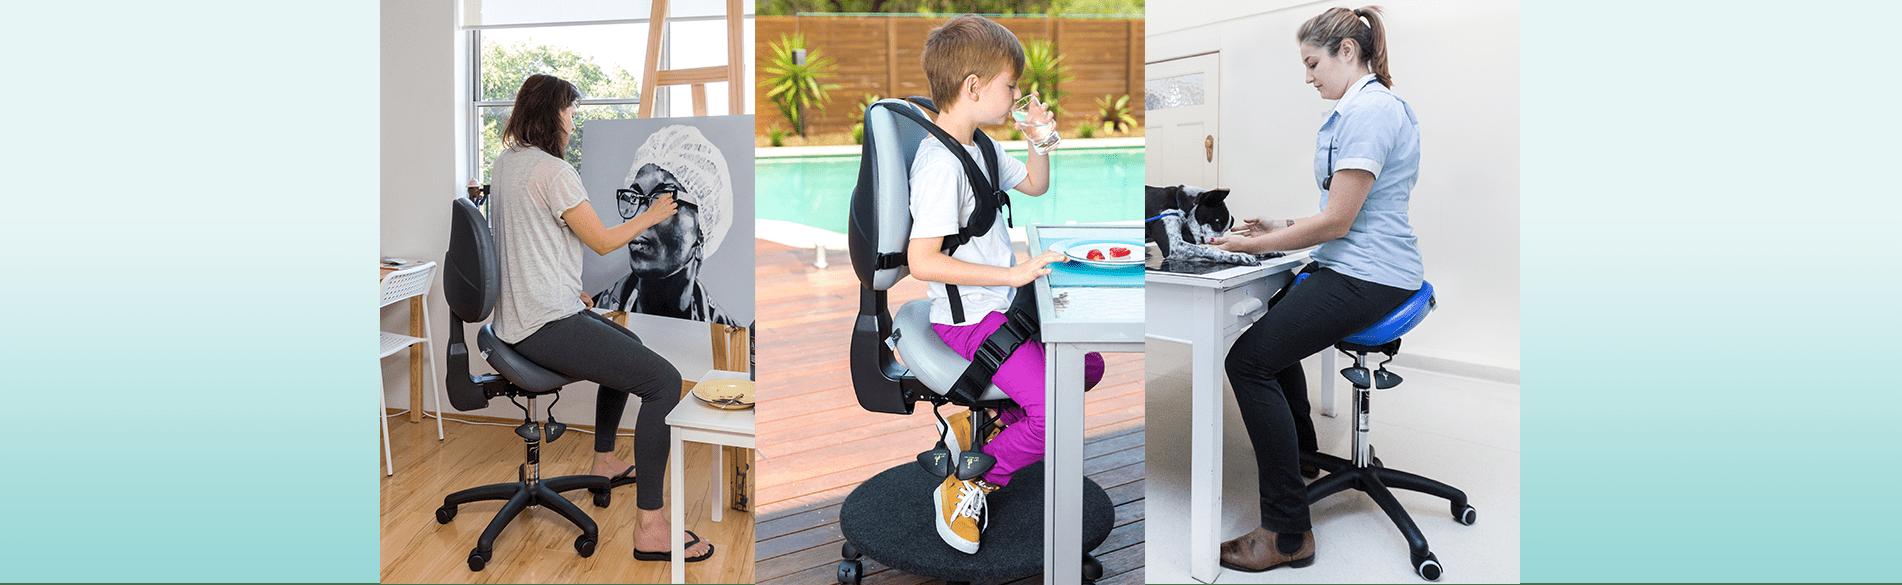 73b592215 Ergonomic Low Saddle Seat Chairs